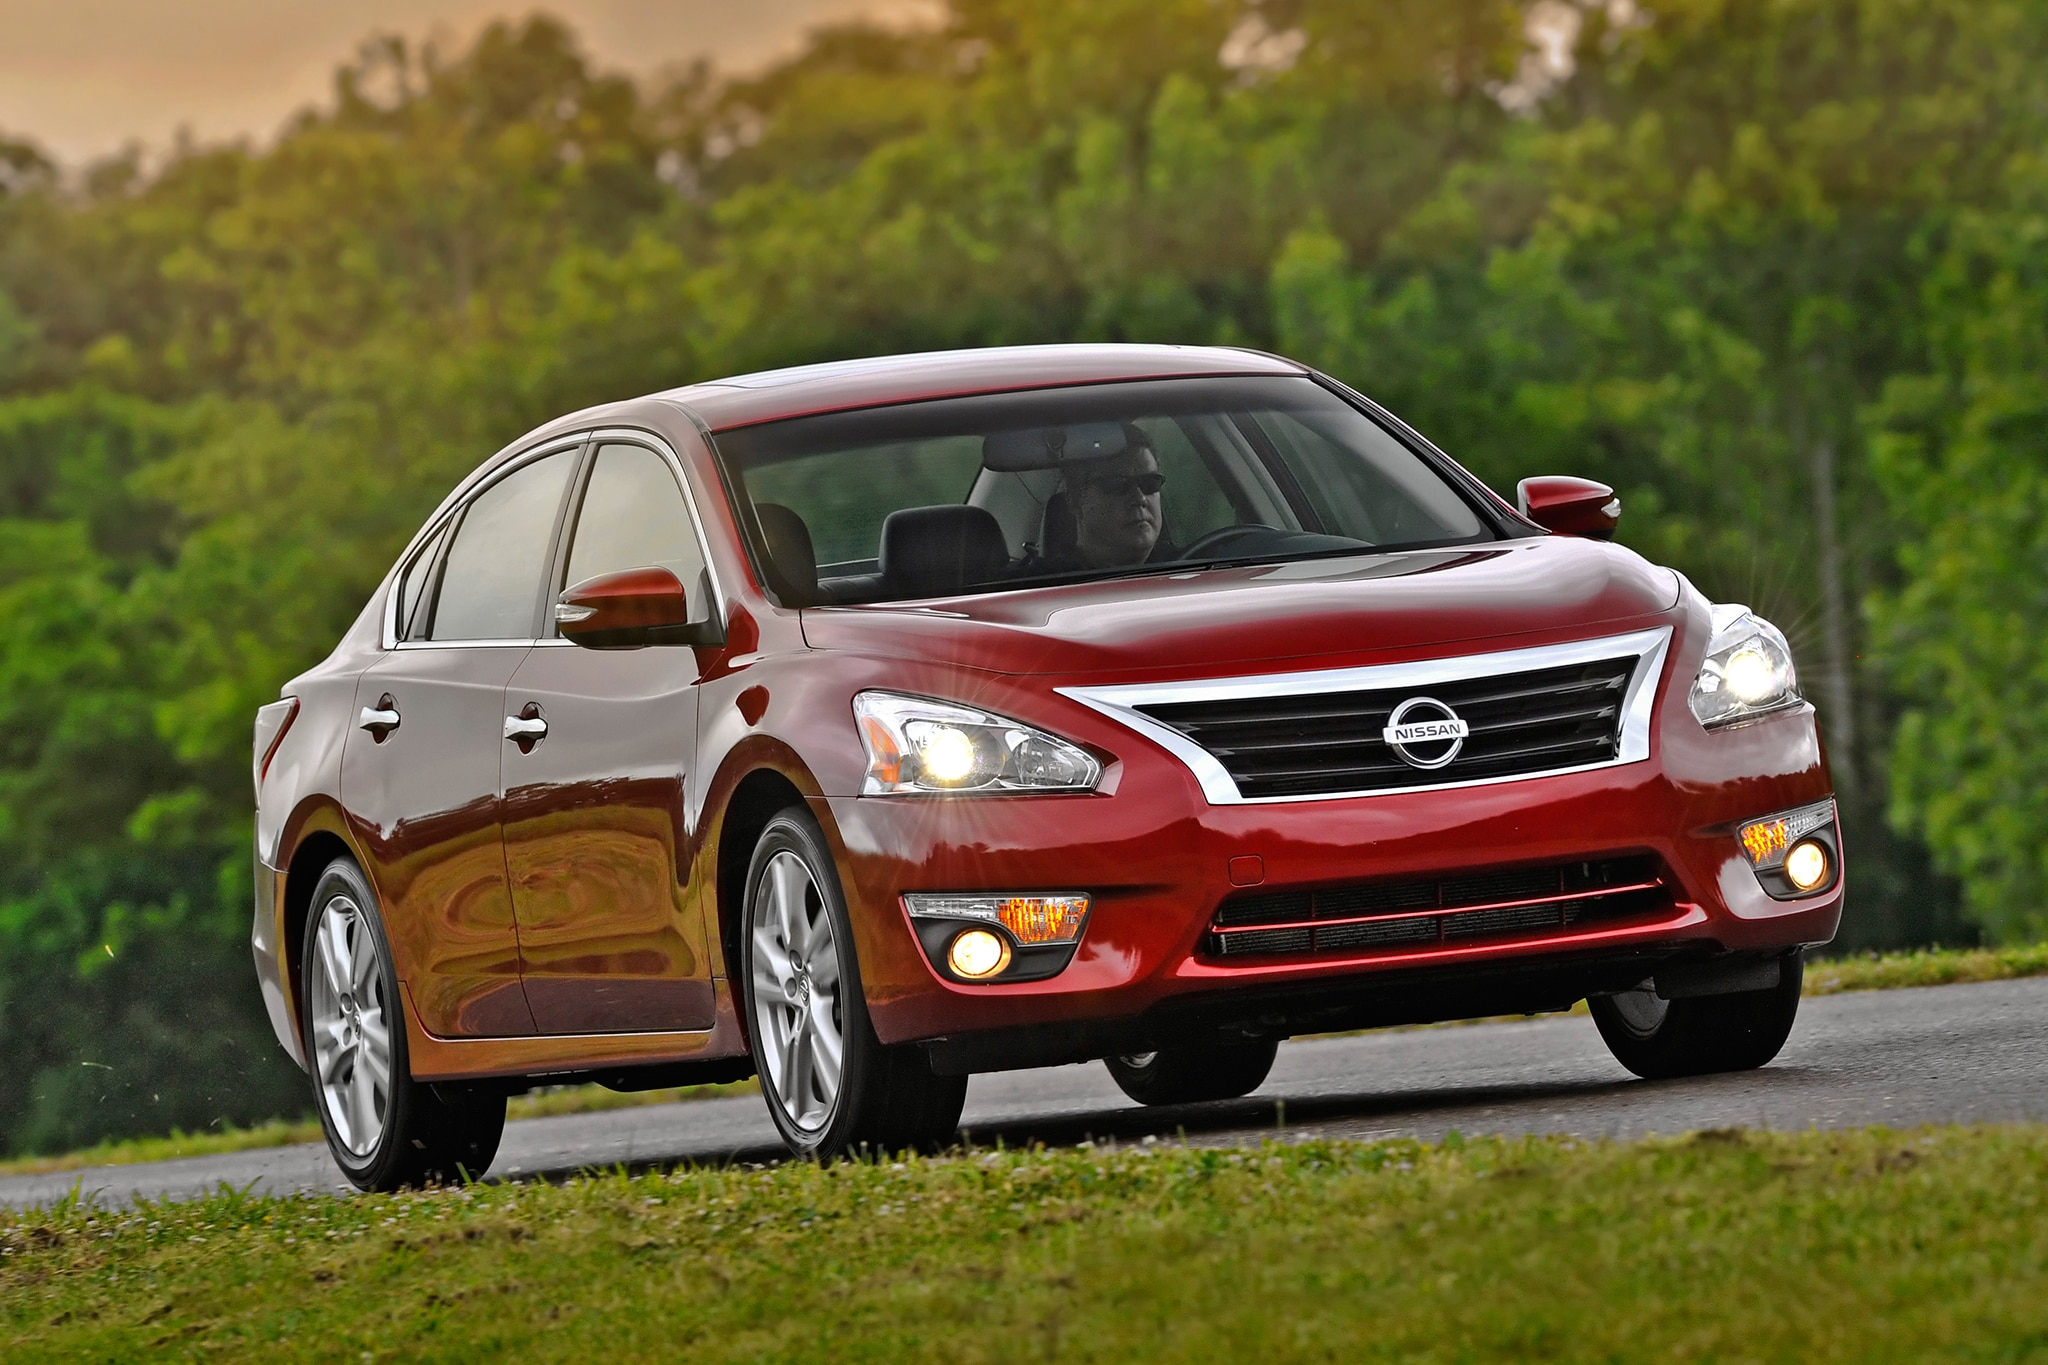 2013 Nissan Altima Three Quarters Rear View1